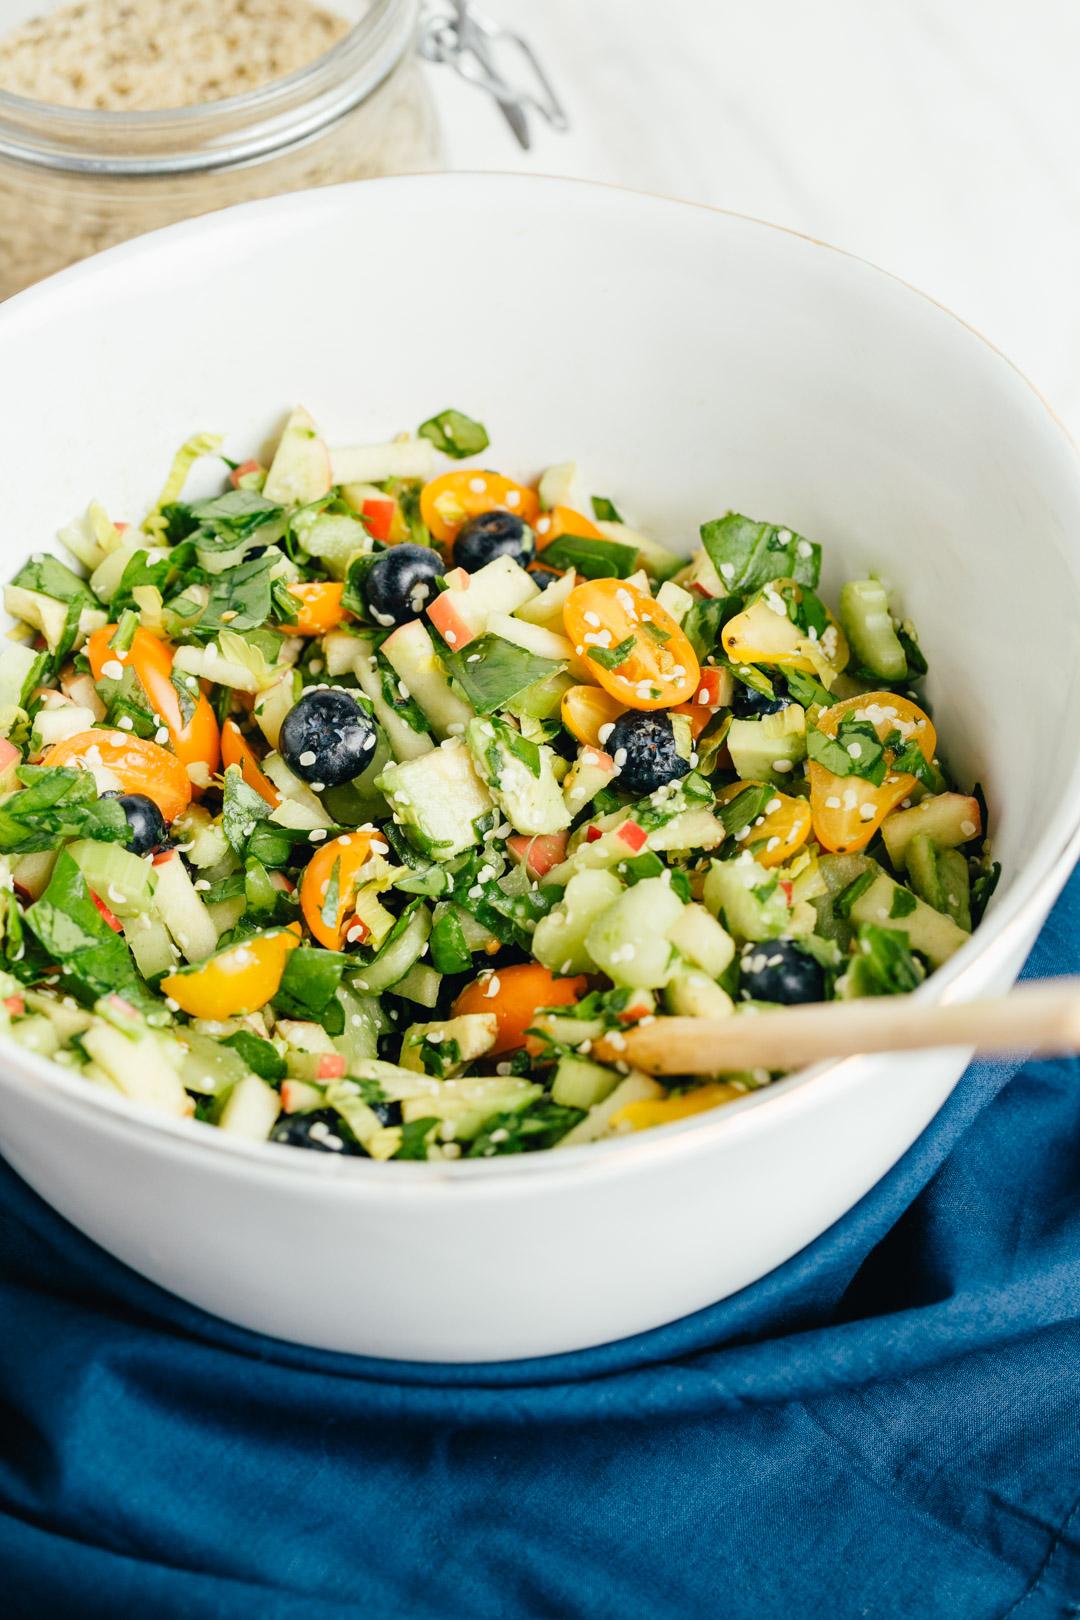 Detox-Salad-Emma-Ryan-4318.jpg